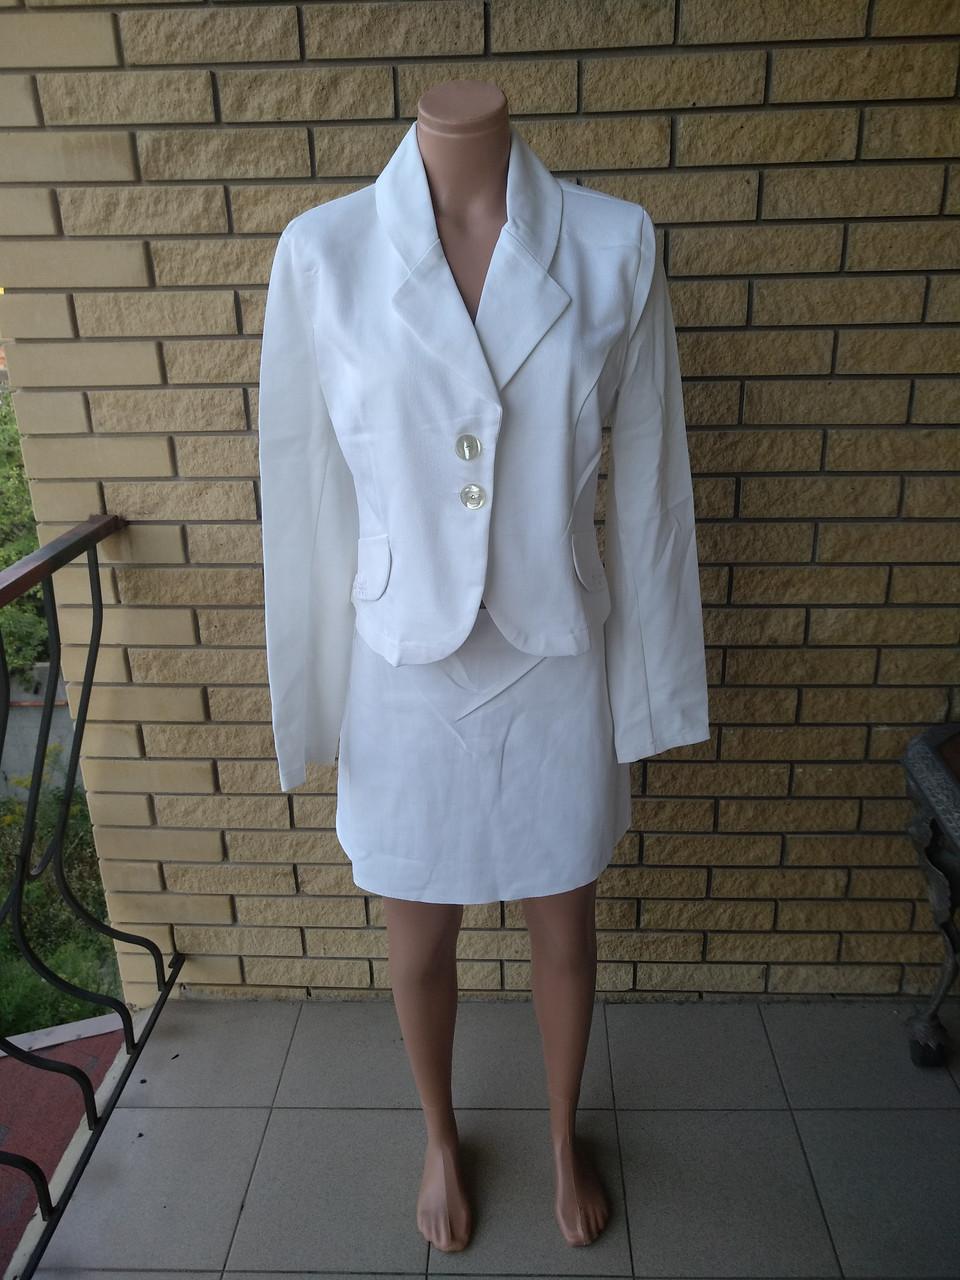 aced983228b Костюм женский пиджак с юбкой NN